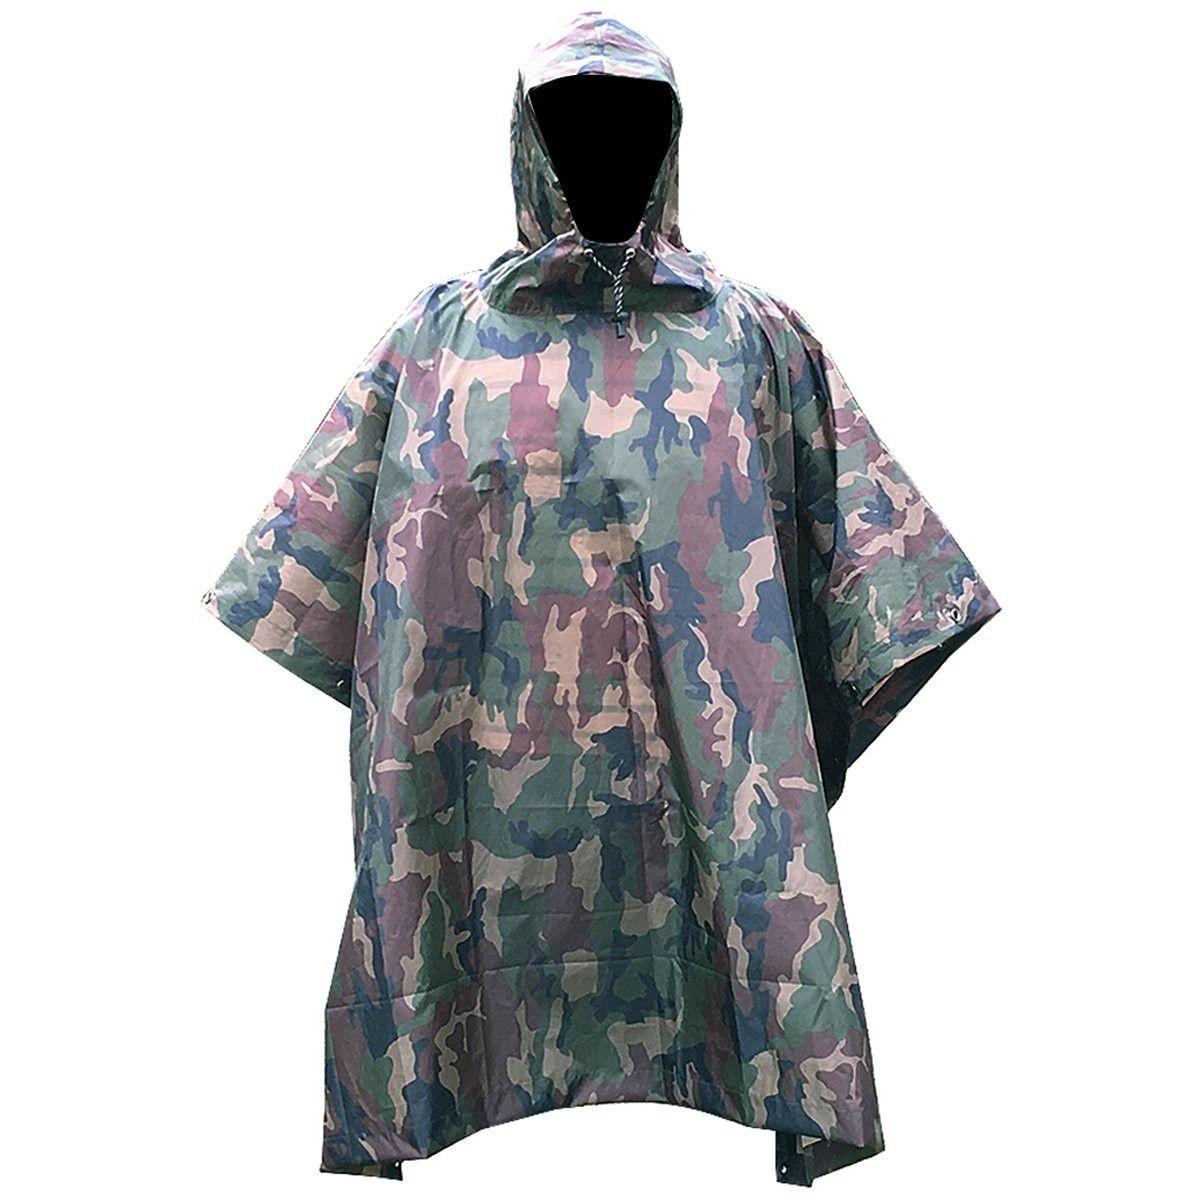 Camouflage Rain Coat Travel Hoodie Waterproof Poncho Hiking Survival Shelter